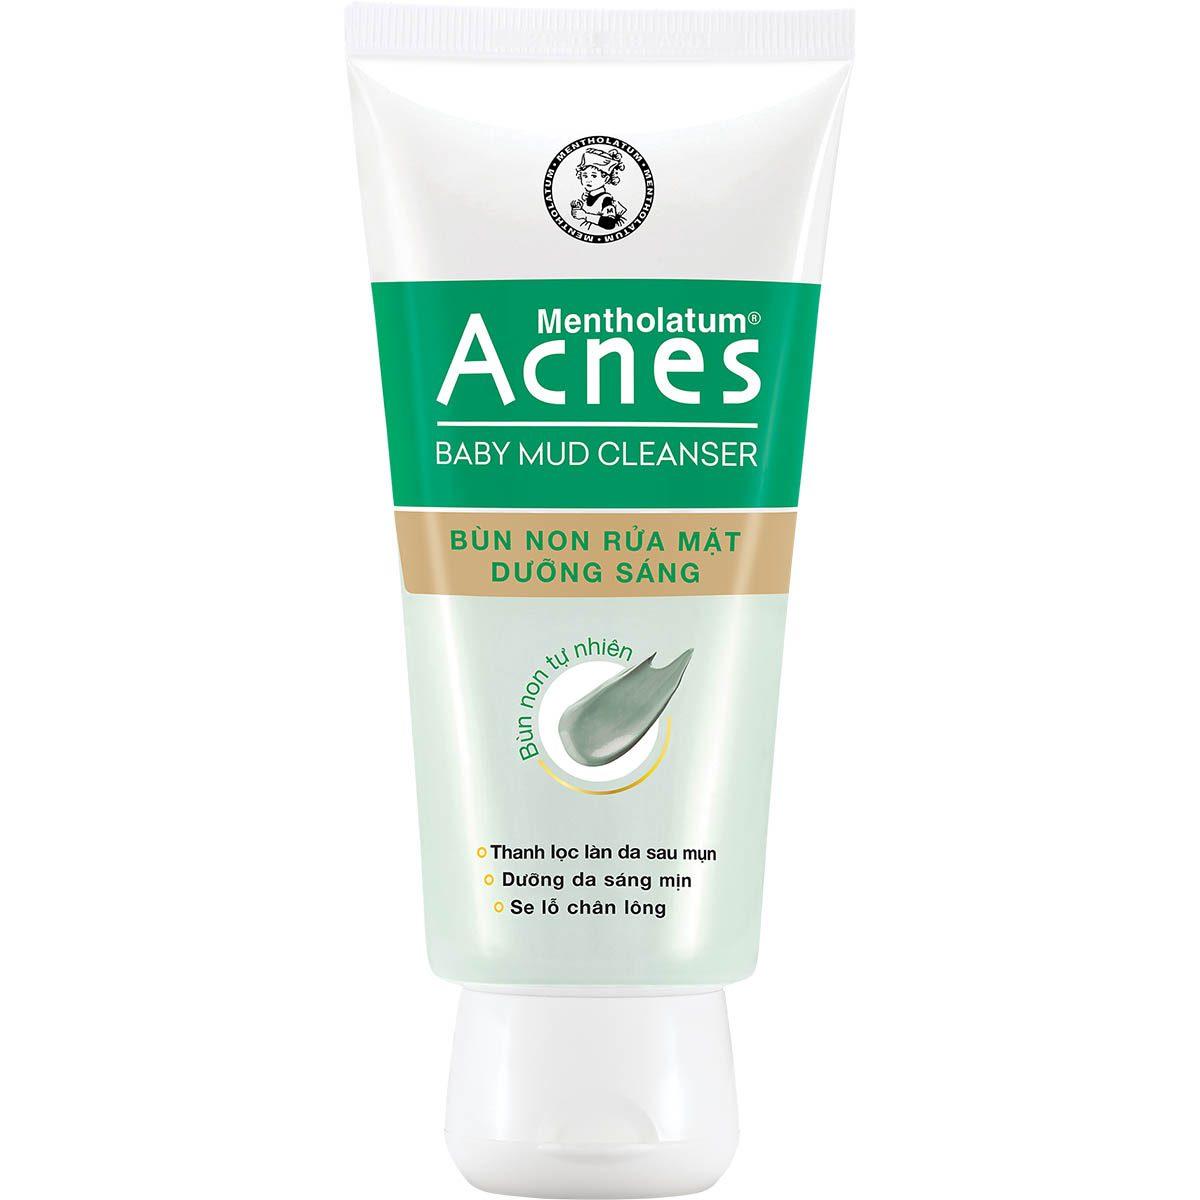 Acnes baby mud cleanser bun non rua mat duong sang da 1200x1200